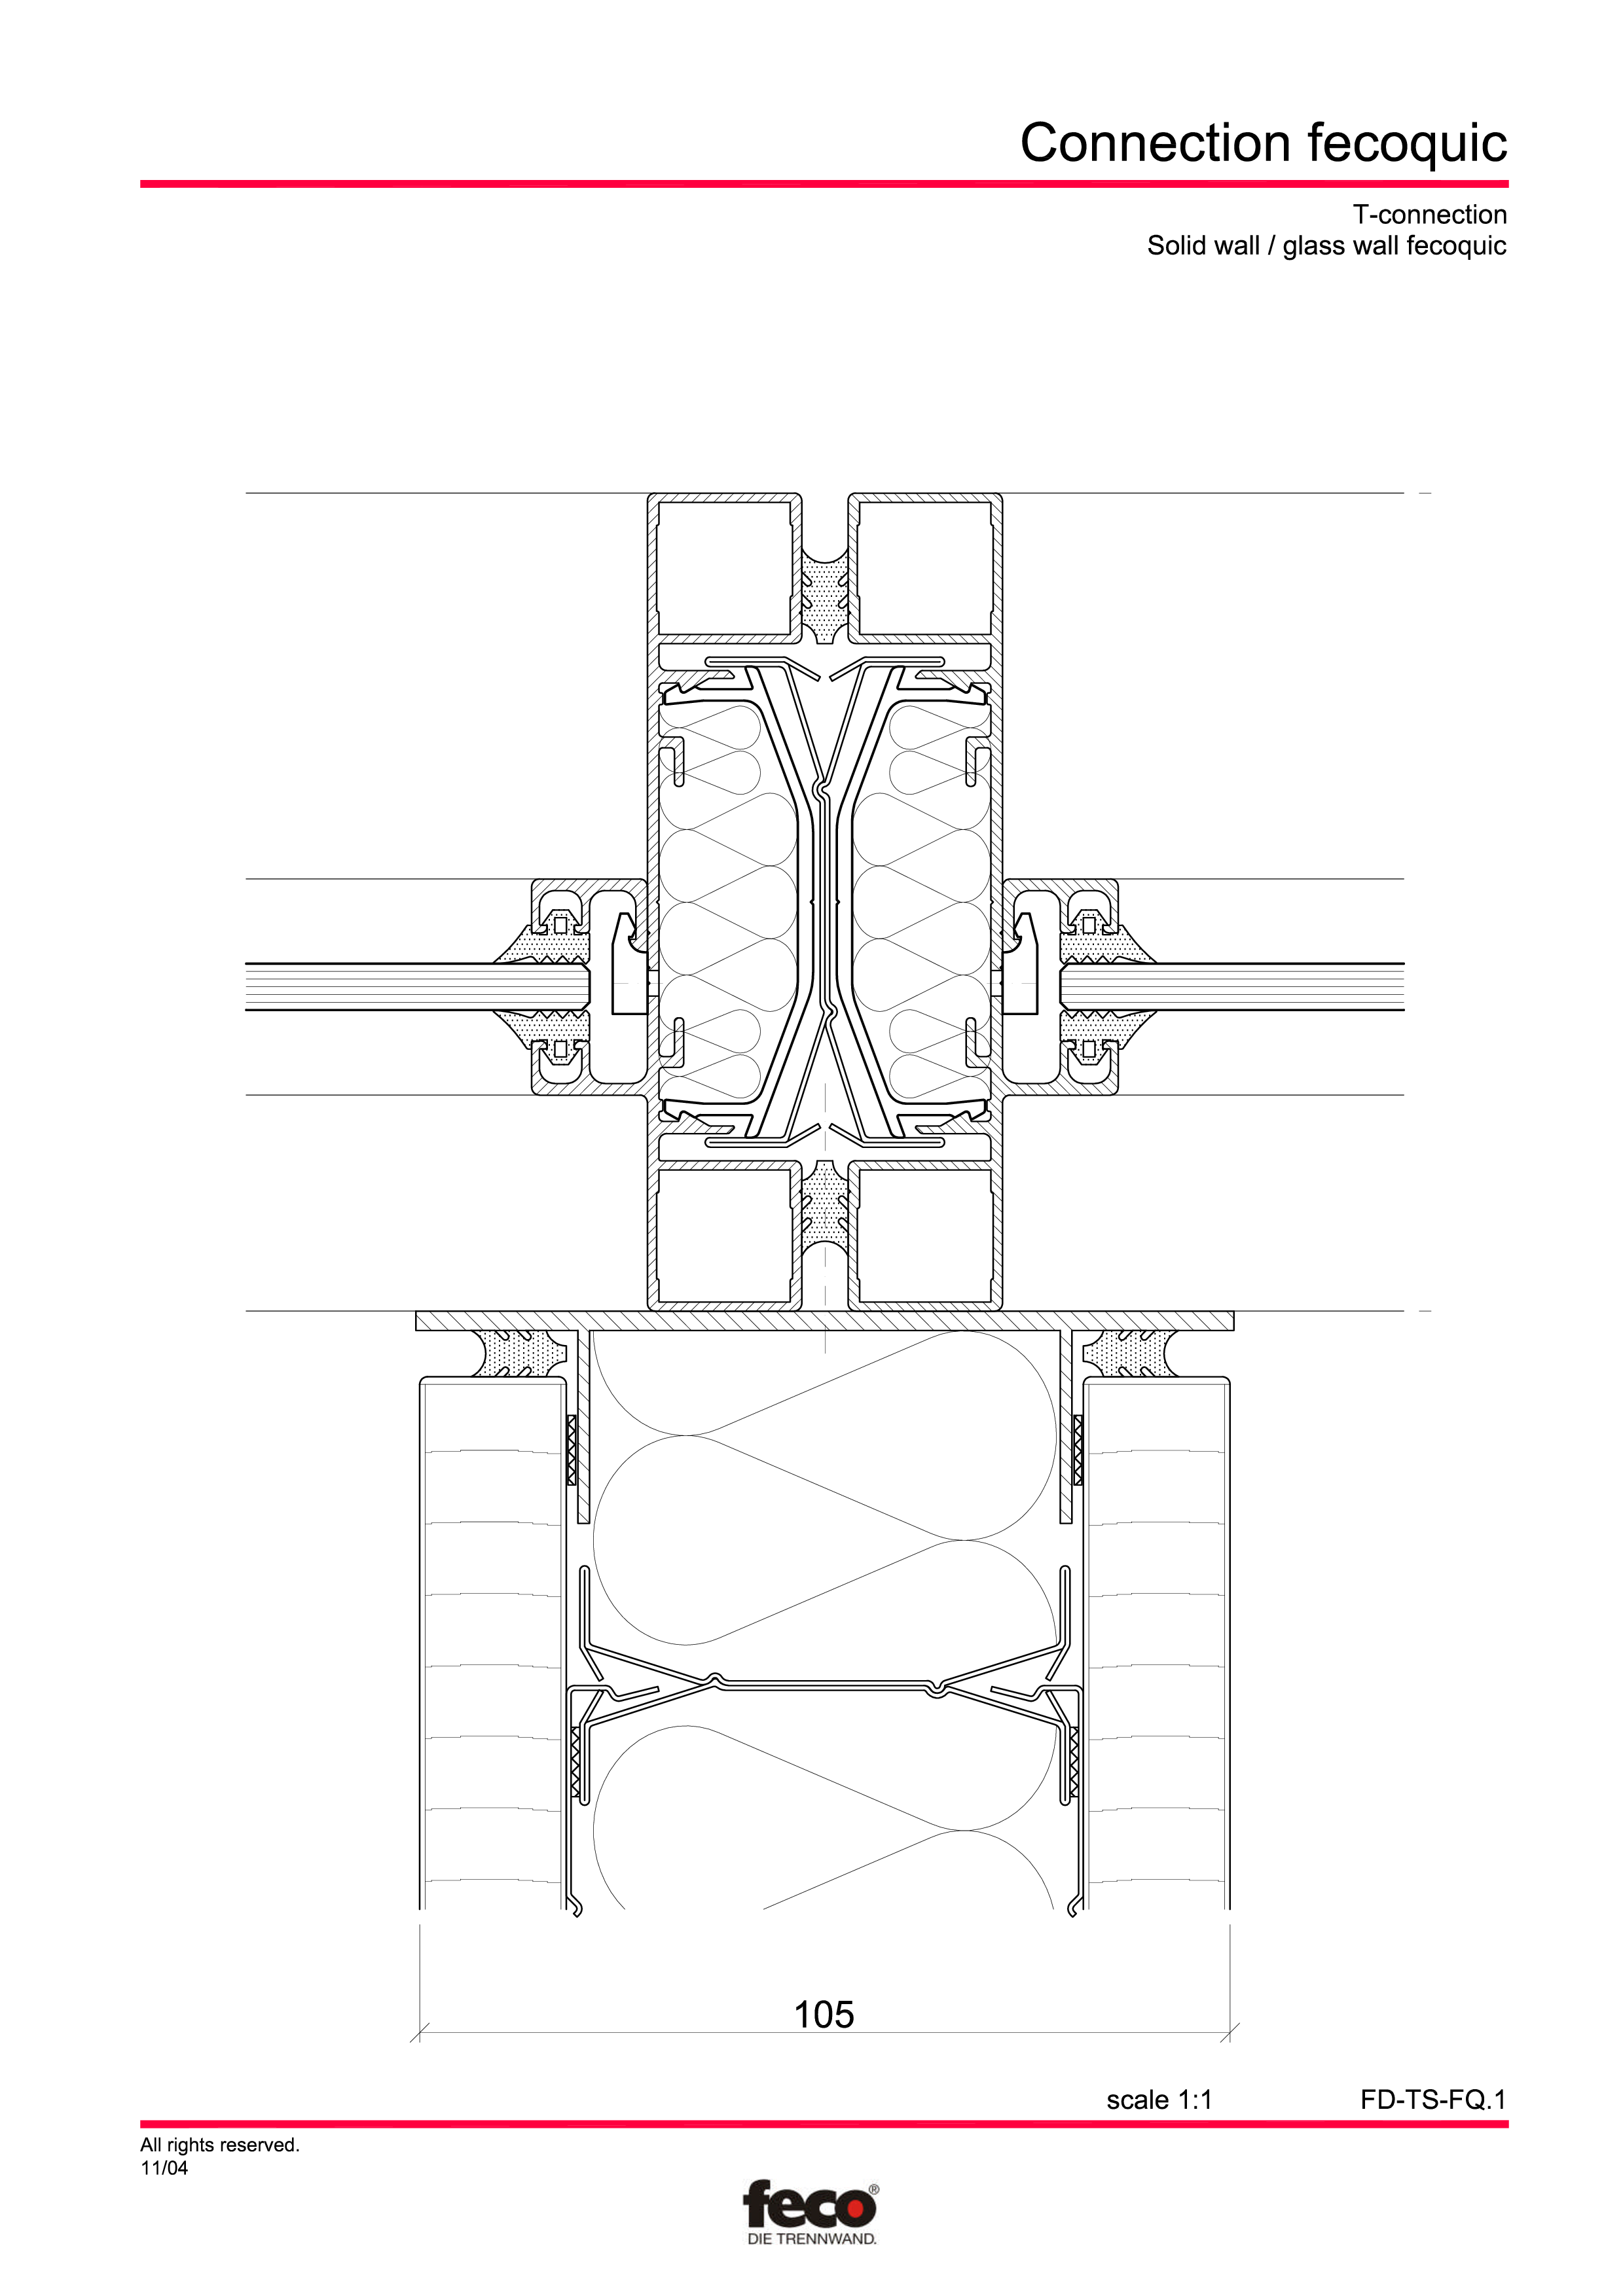 Pagina 5 - CAD-PDF Detaliu racord pereti FECO Detaliu de montaj FecoPur, FecoFix, FecoLux